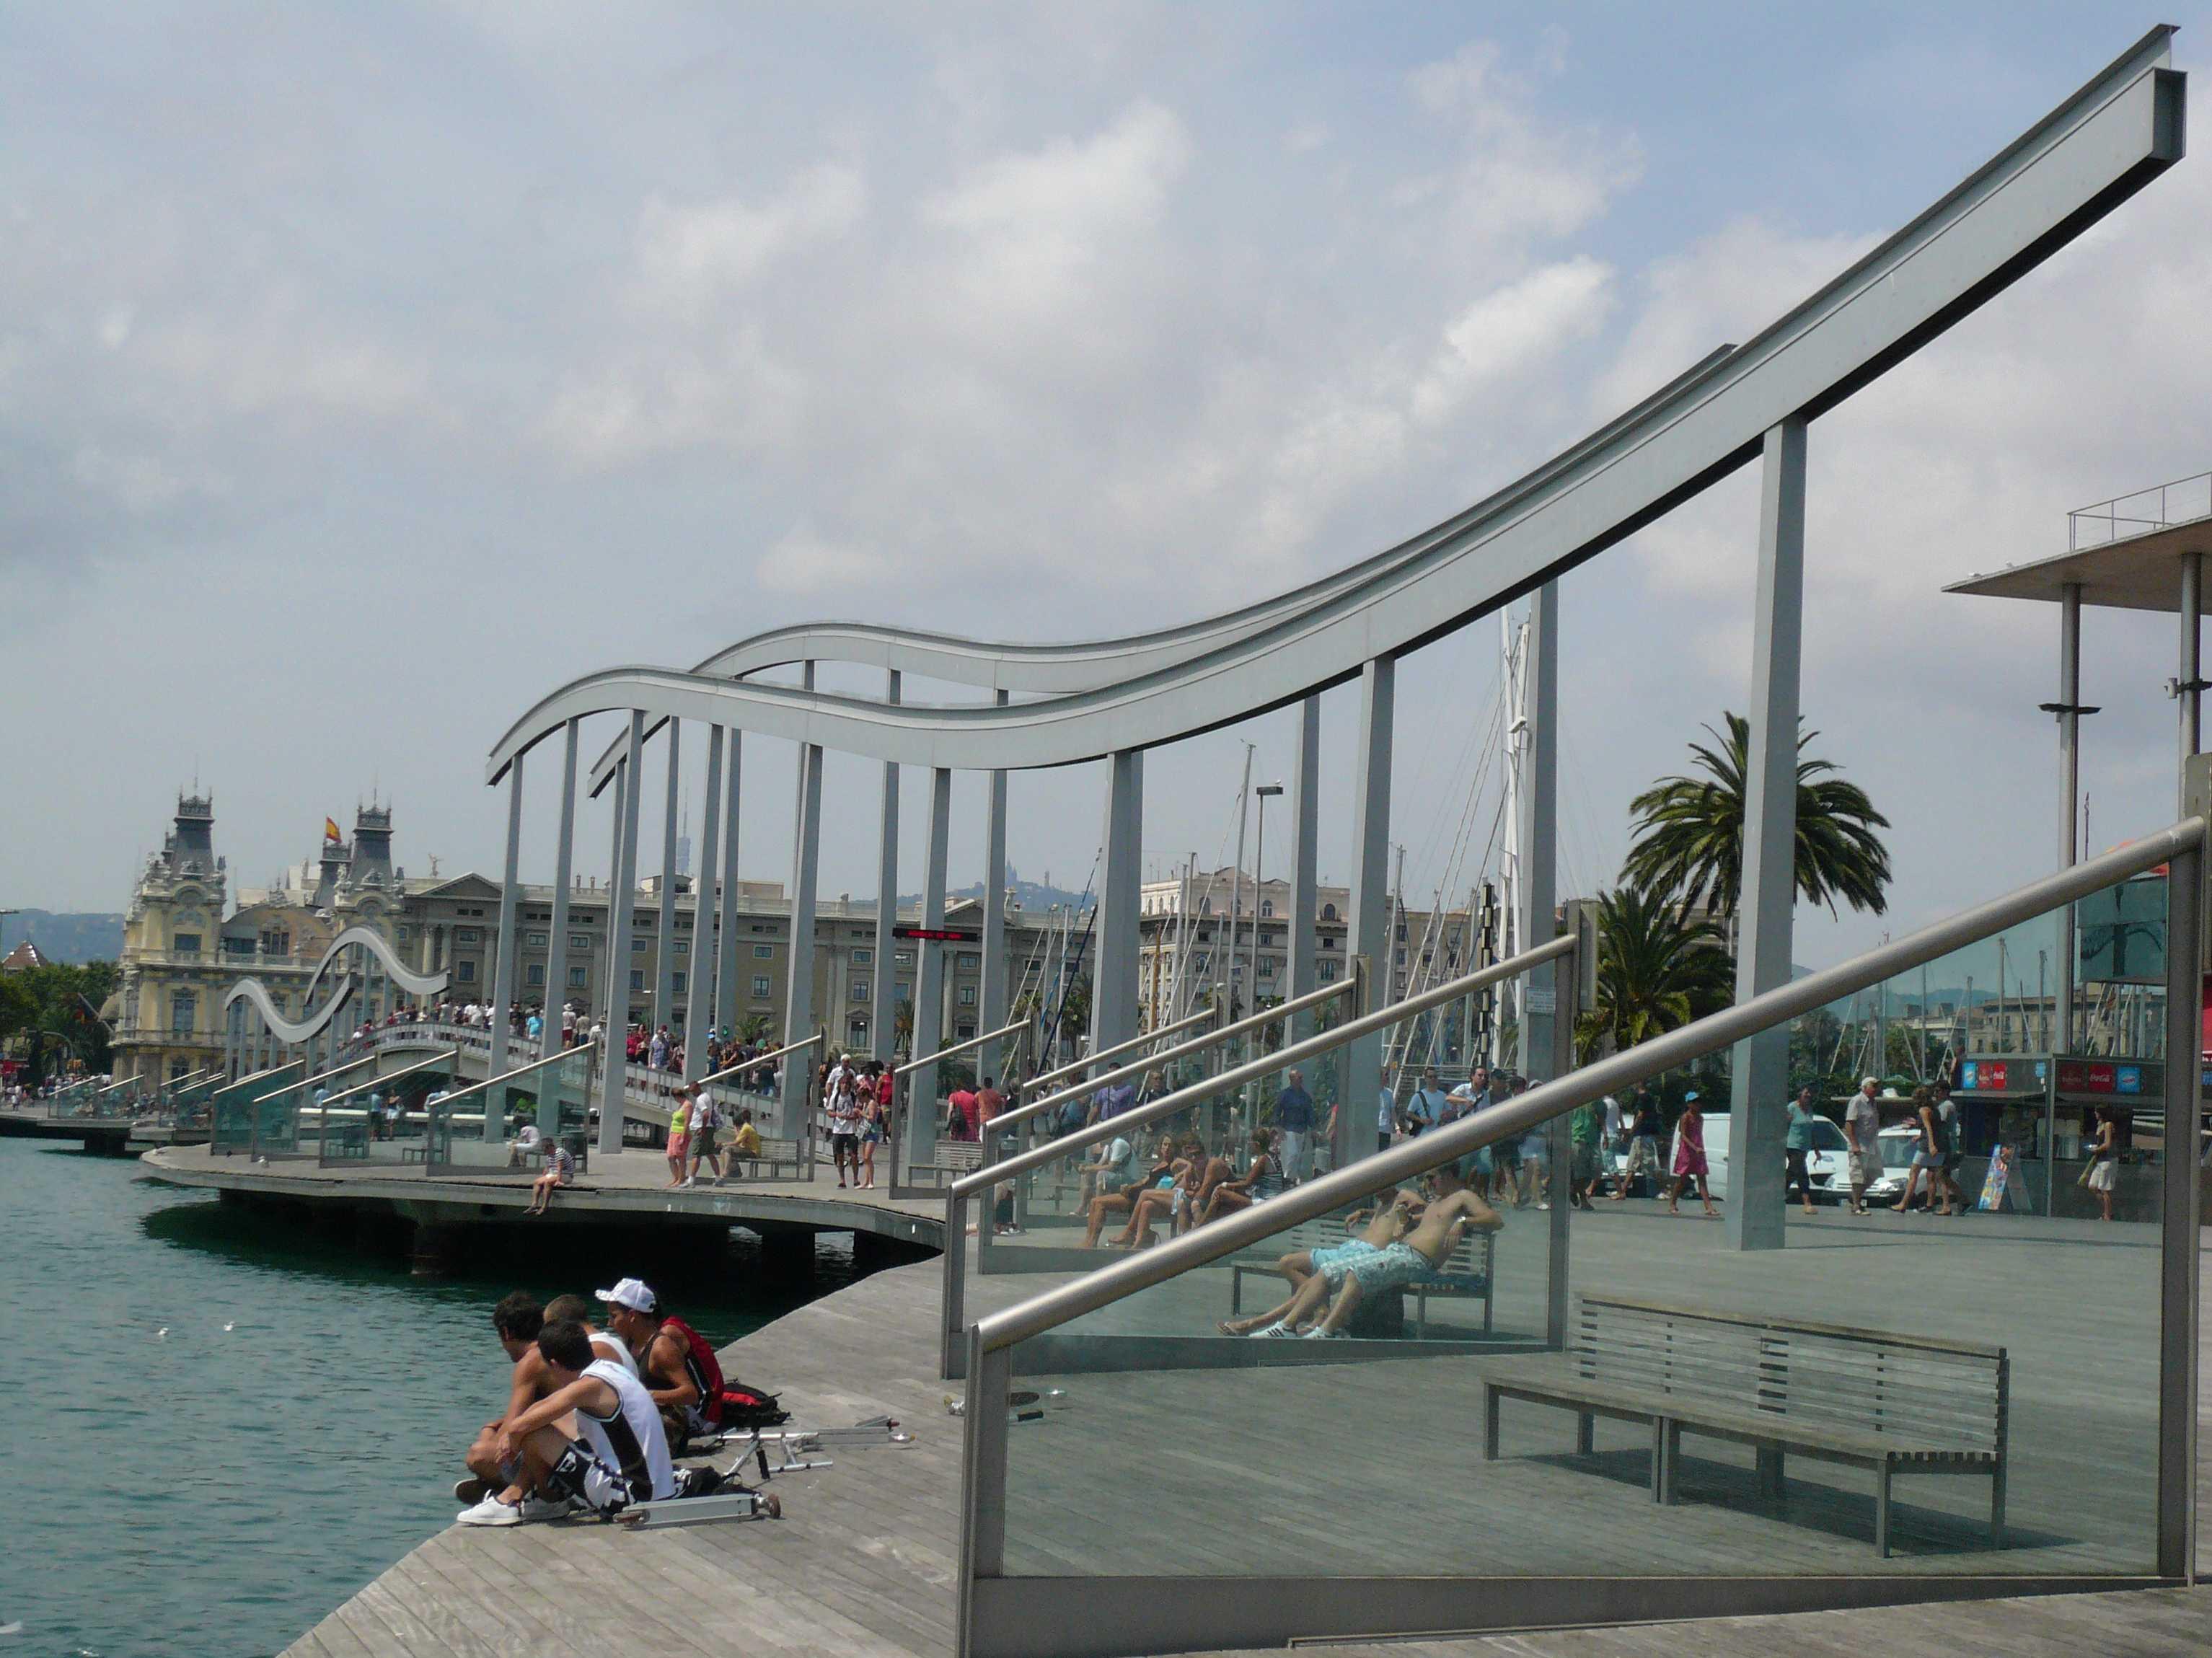 spanien costa brava sehensw rdigkeiten barcelona ramblas del mar. Black Bedroom Furniture Sets. Home Design Ideas